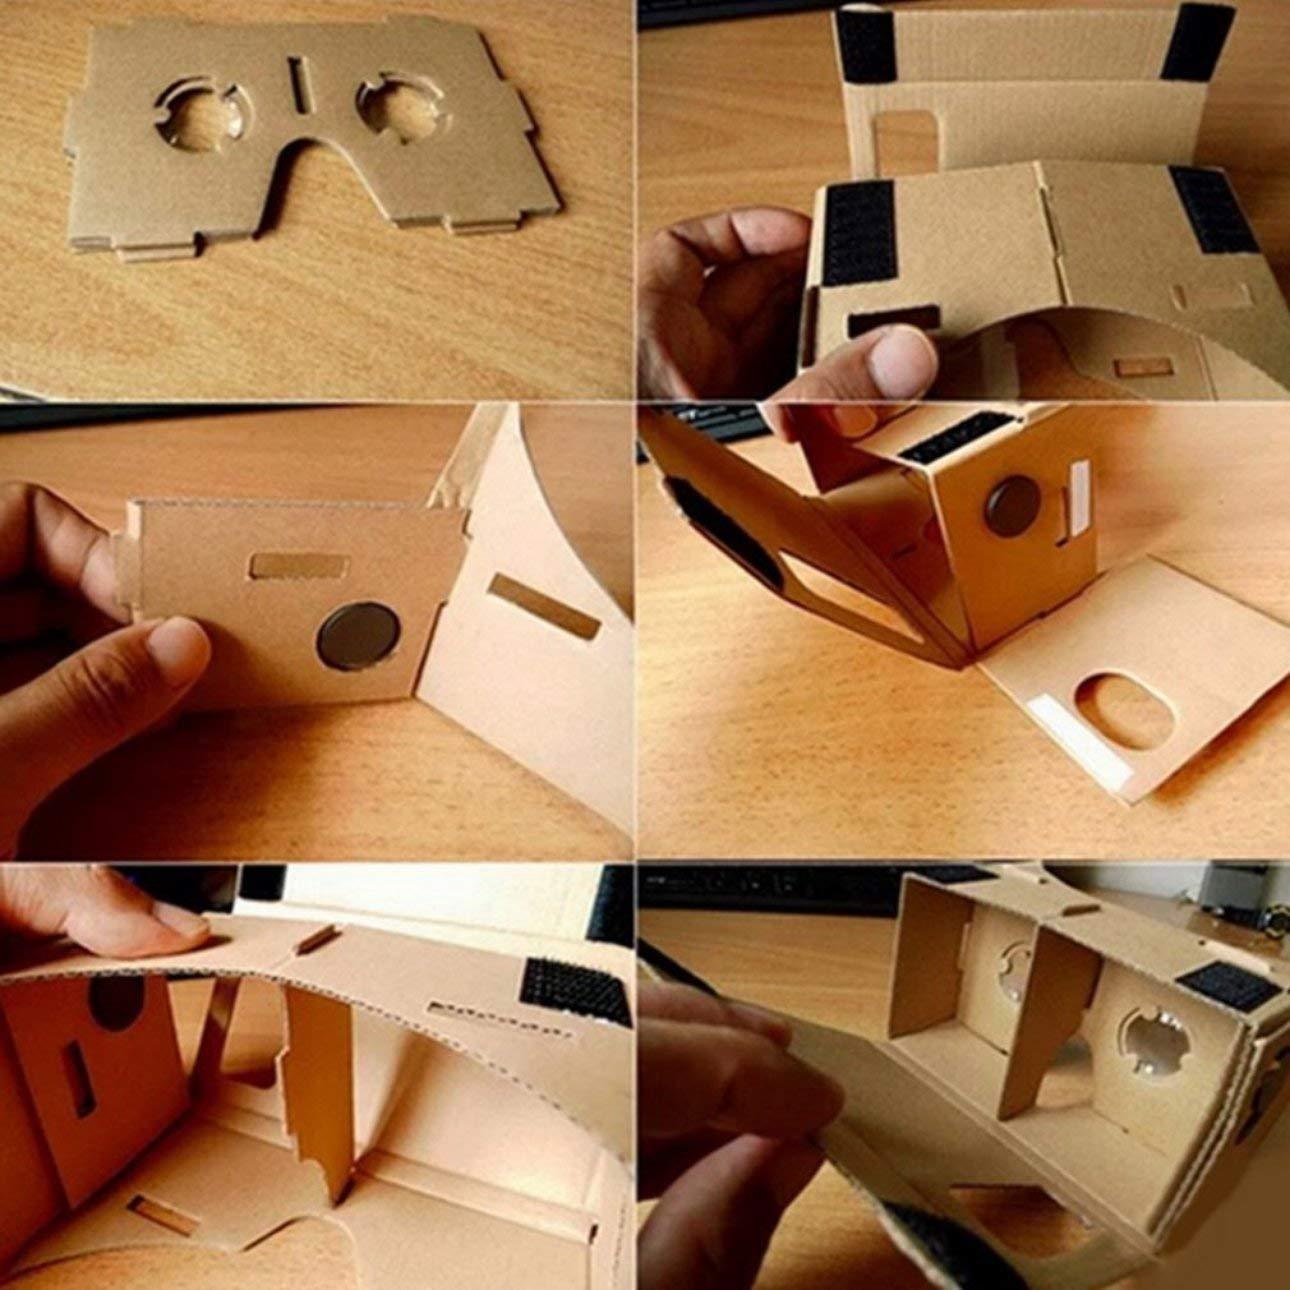 Liobaba DIY Cardboard 3D VR Virtual Reality Glasses for Smartphone DIY Magnet Google Cardboards Glasses by Liobaba (Image #9)